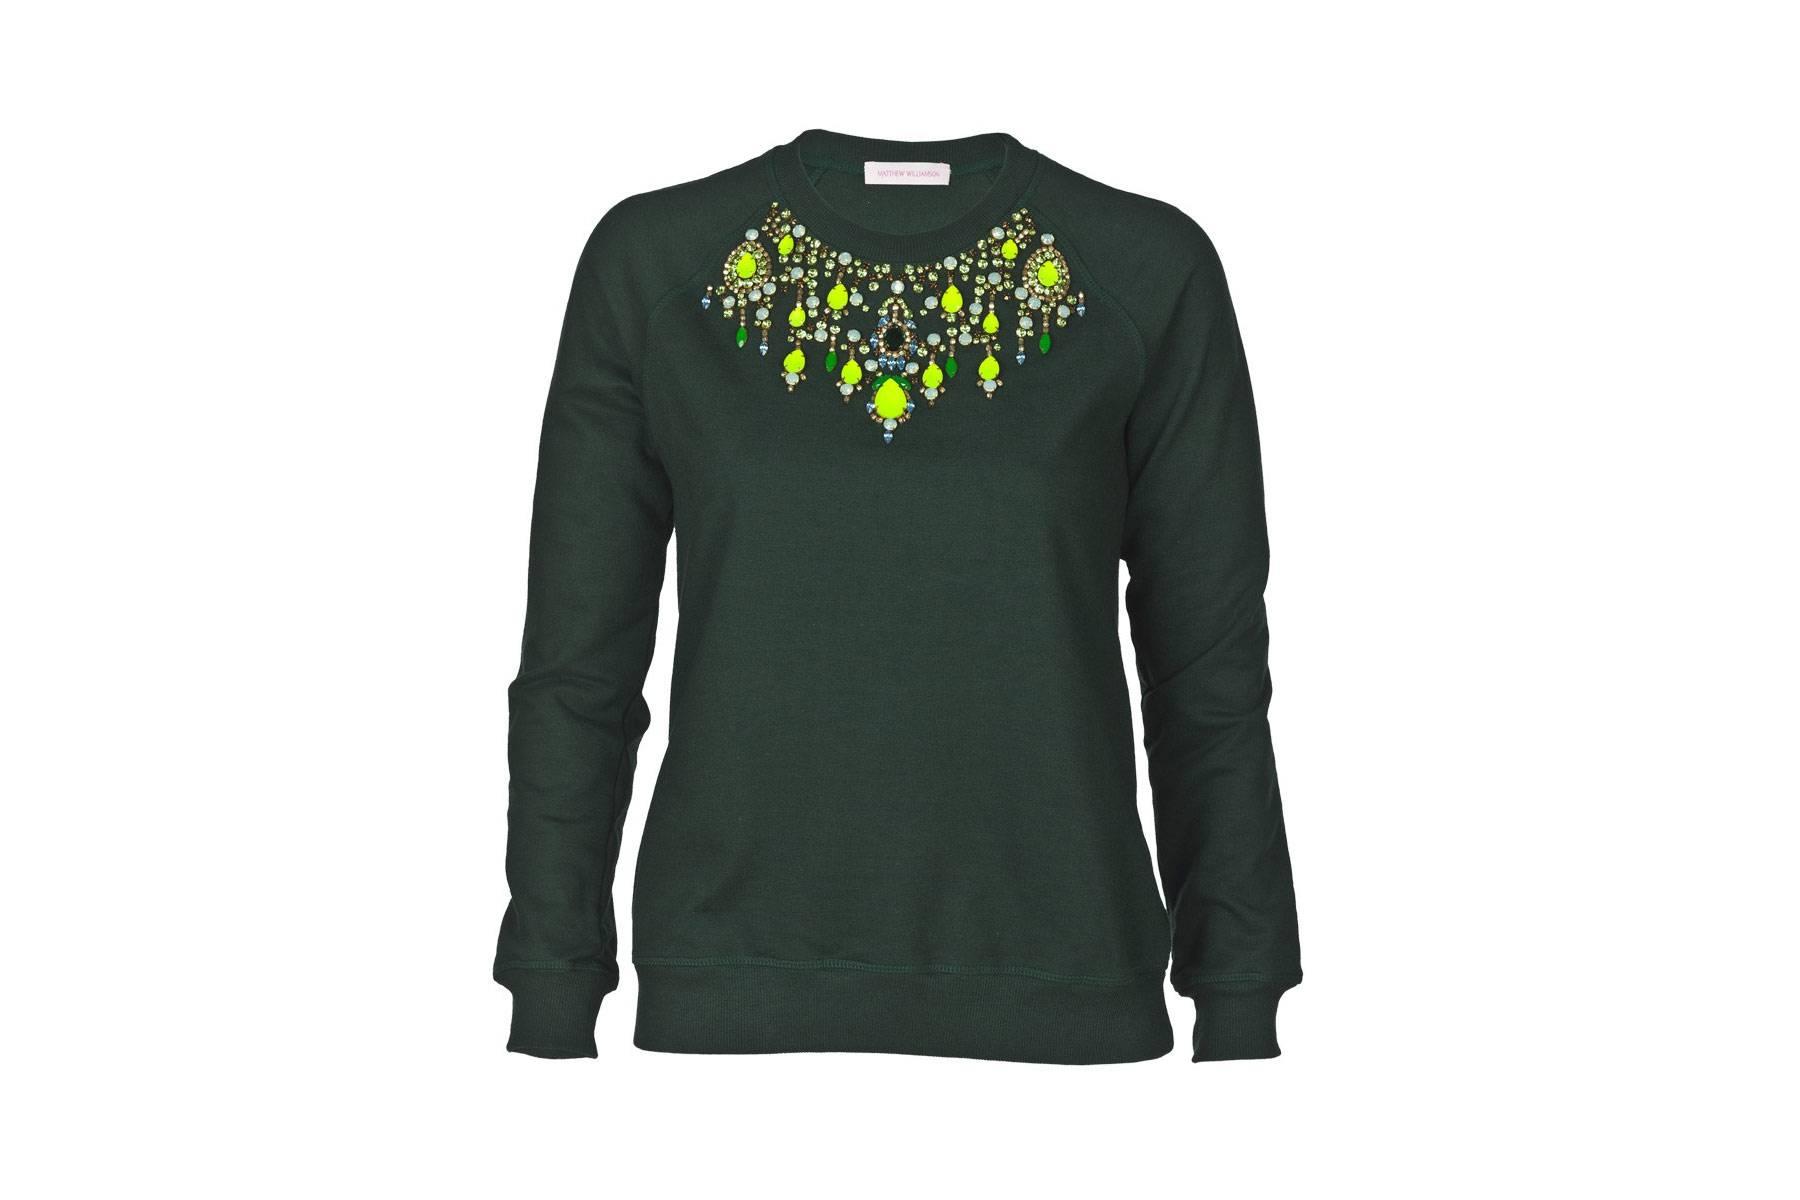 sweatshirt Of Course She Did: Gwyneth Paltrow Designed an $845 Sweatshirt for Goop